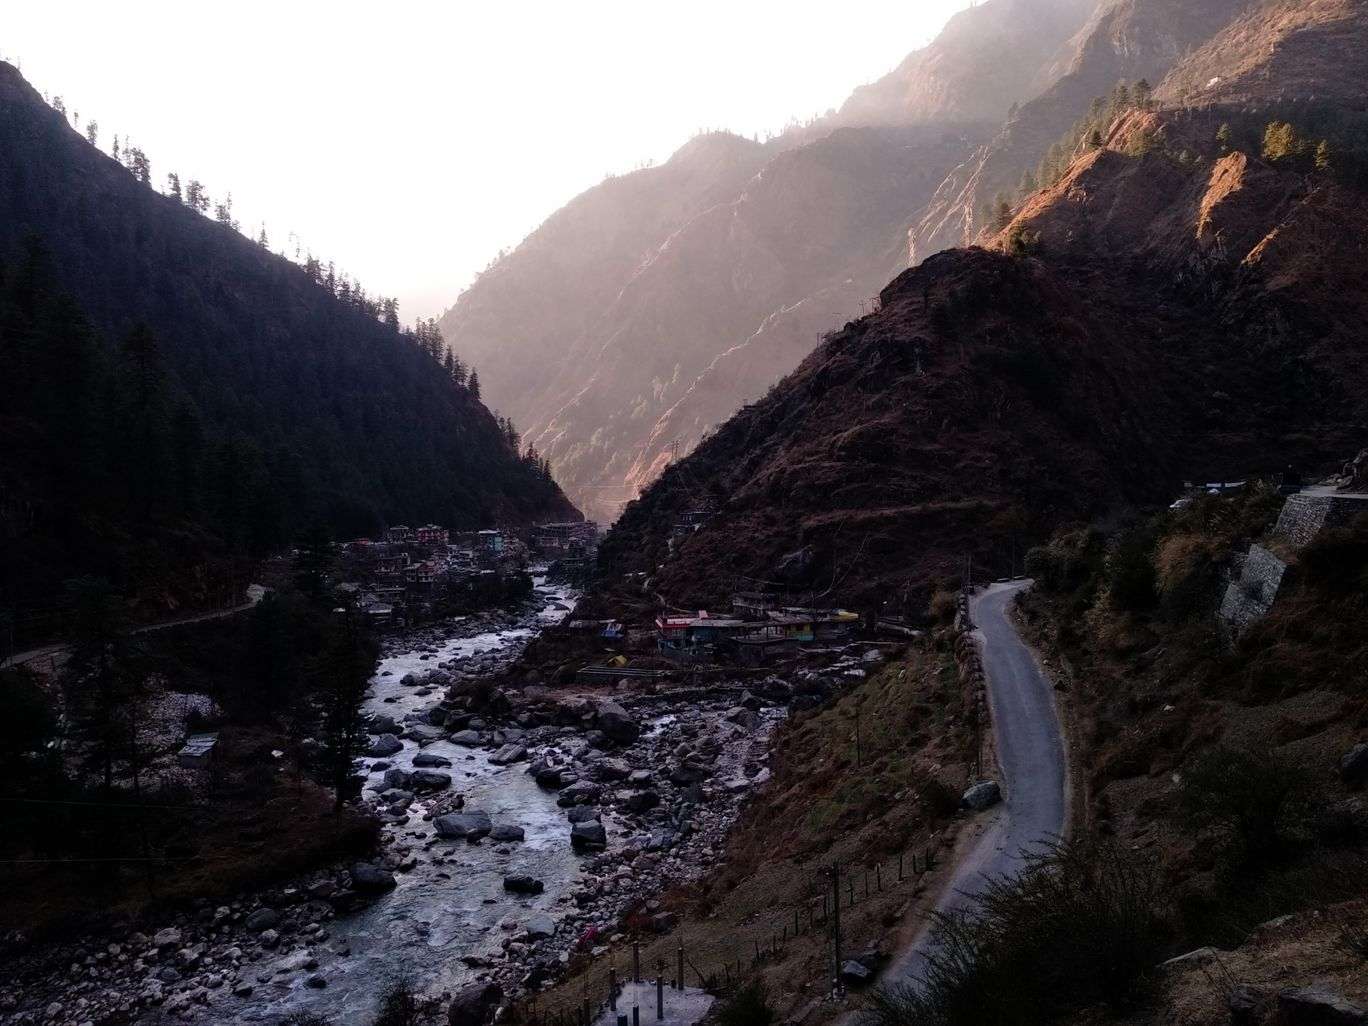 Photo of Manikaran Road By Amaan Siddiqui